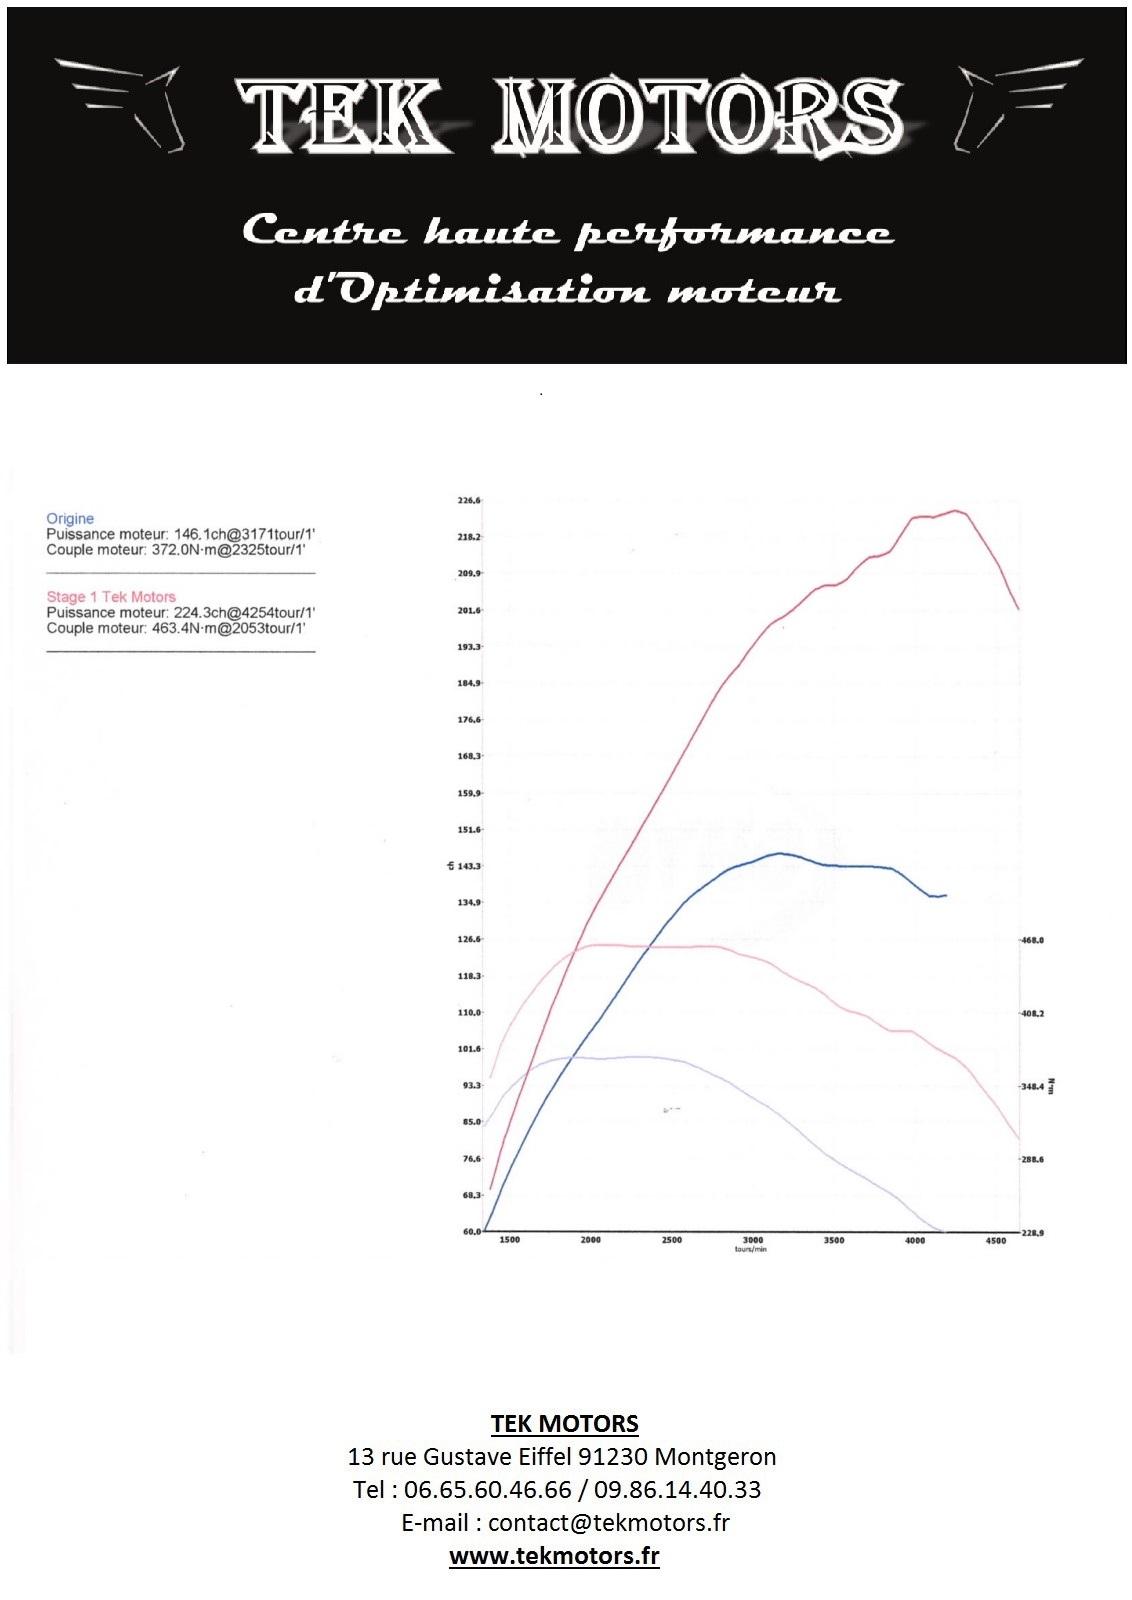 reprogrammation mazda 3 2 2 150 cv    ligne sur mesure inox dans le 92  u00e0 boulogne